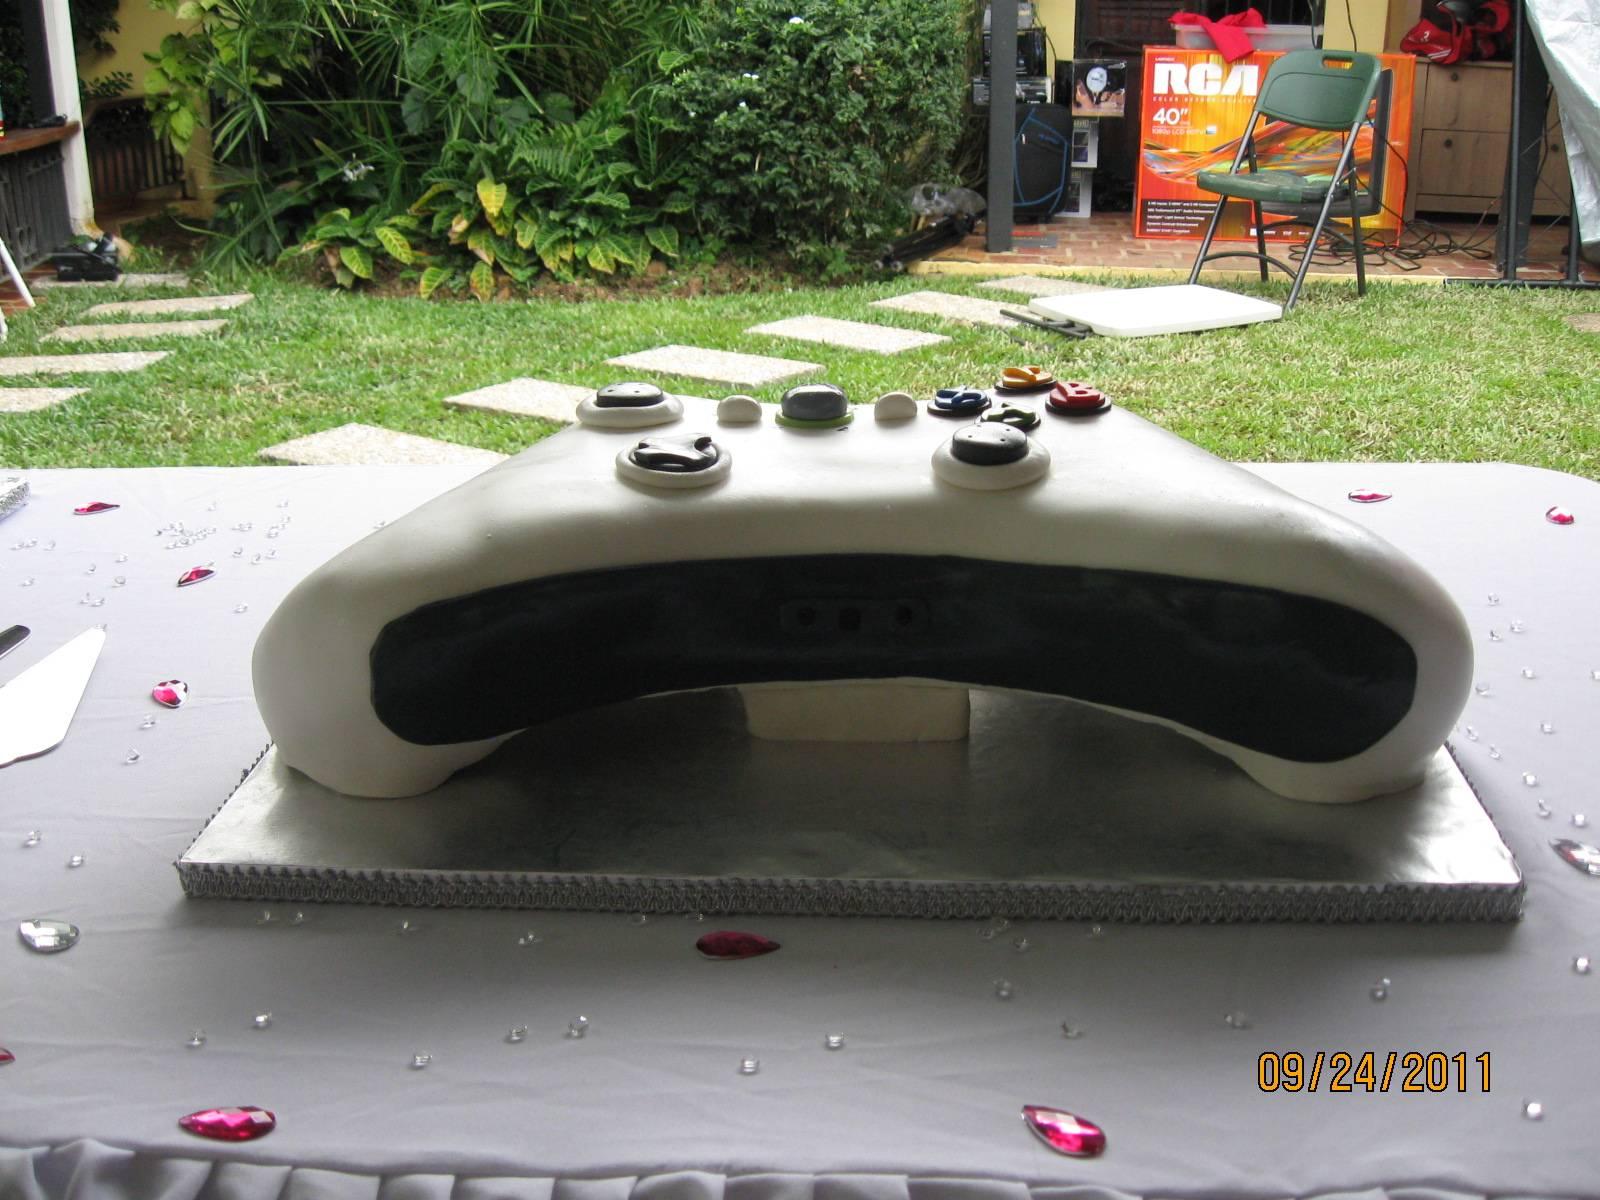 CAKE 16G -X-boc Controller Cake - Back View